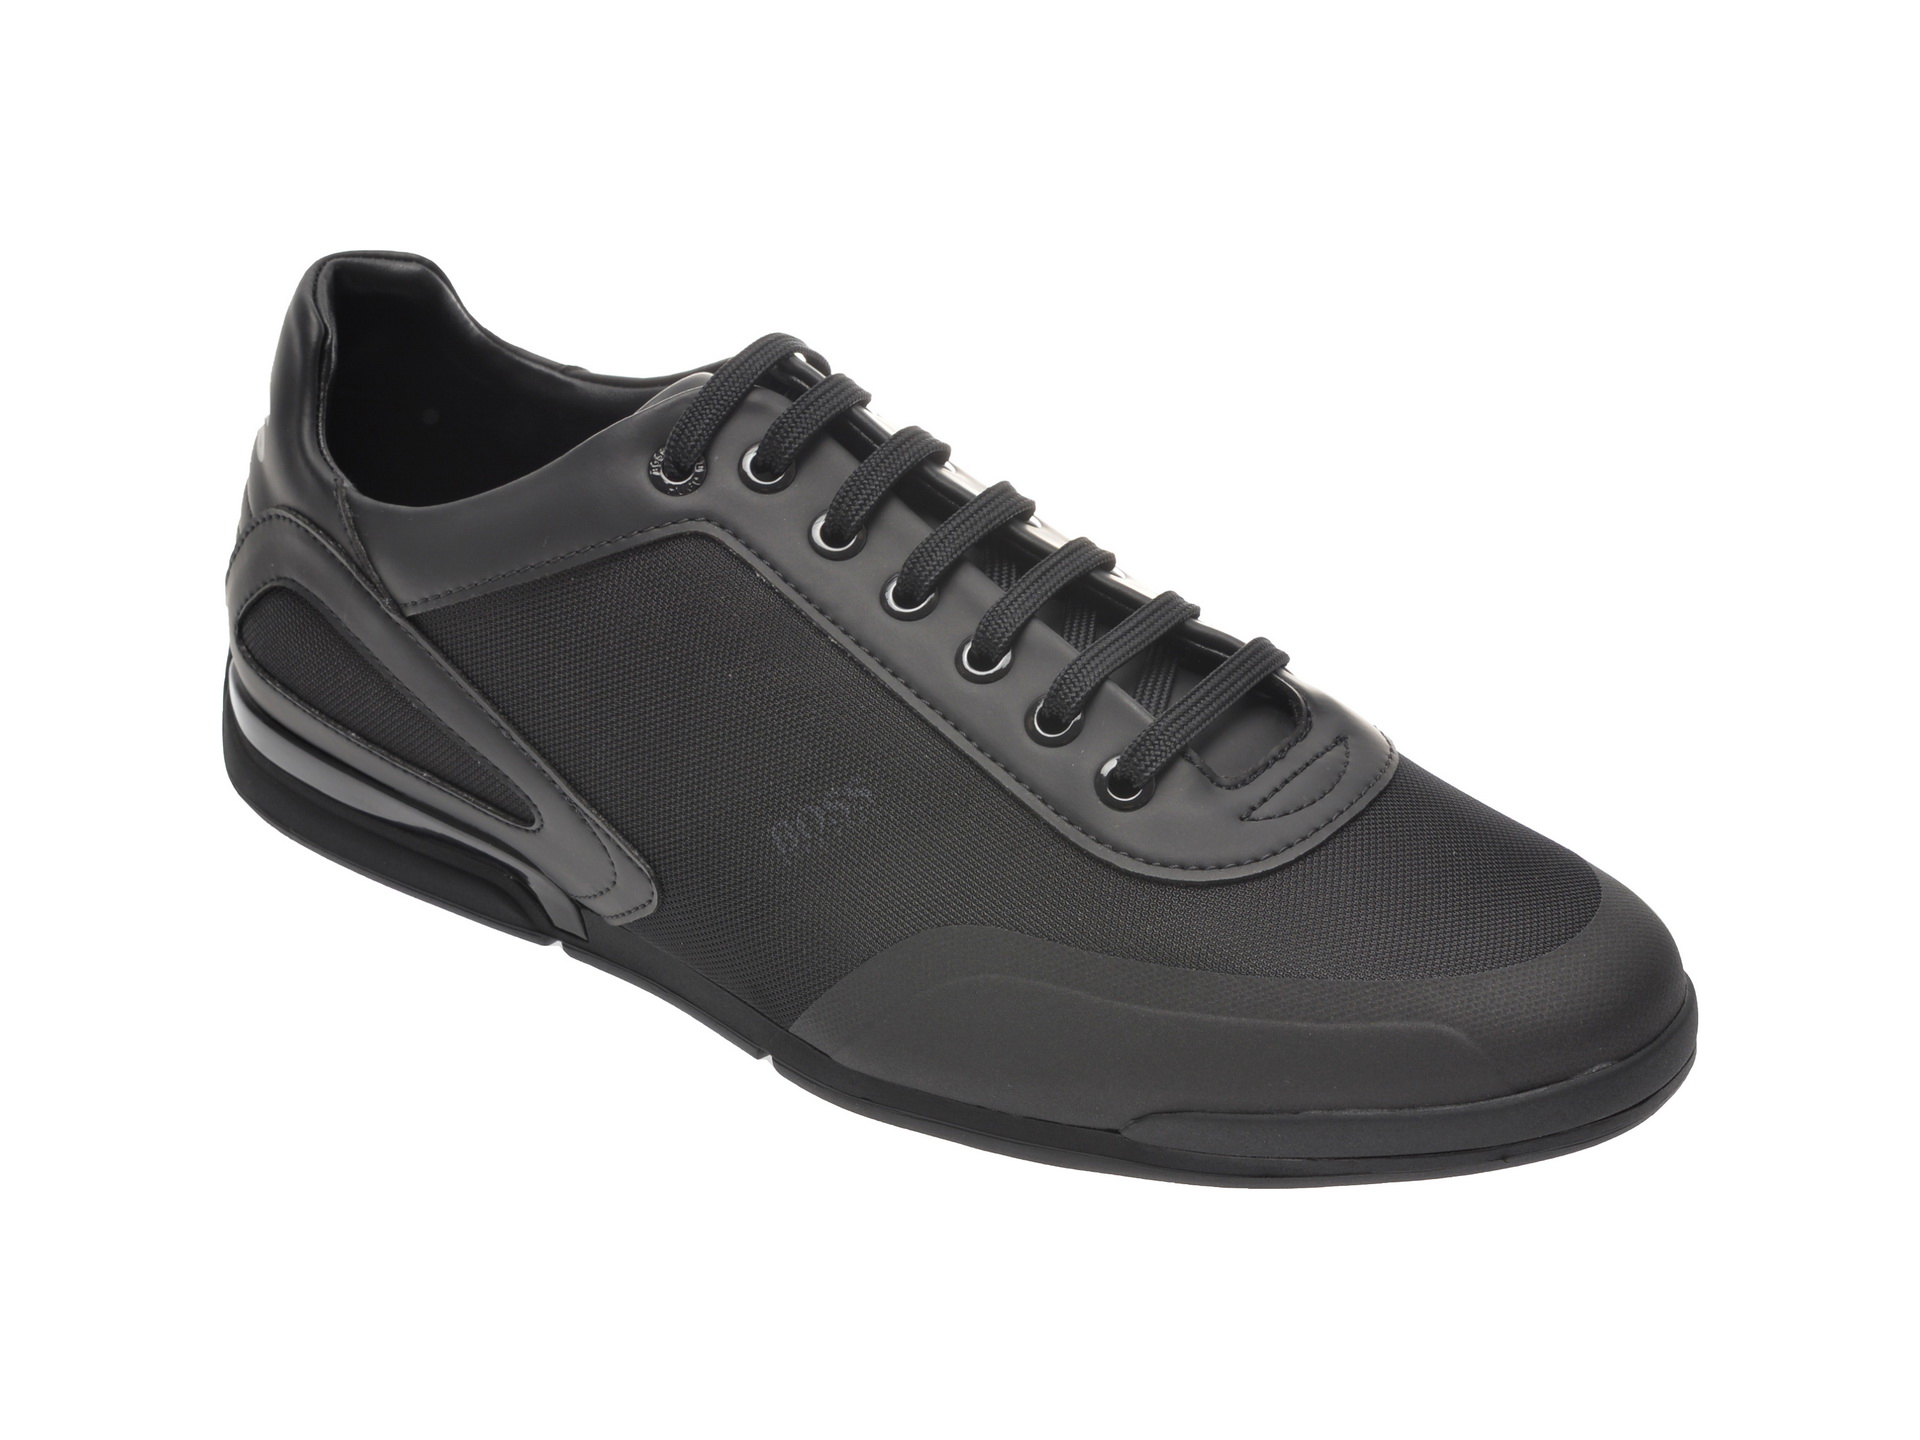 Pantofi sport HUGO BOSS negri, 8234, din material textil si piele ecologica imagine